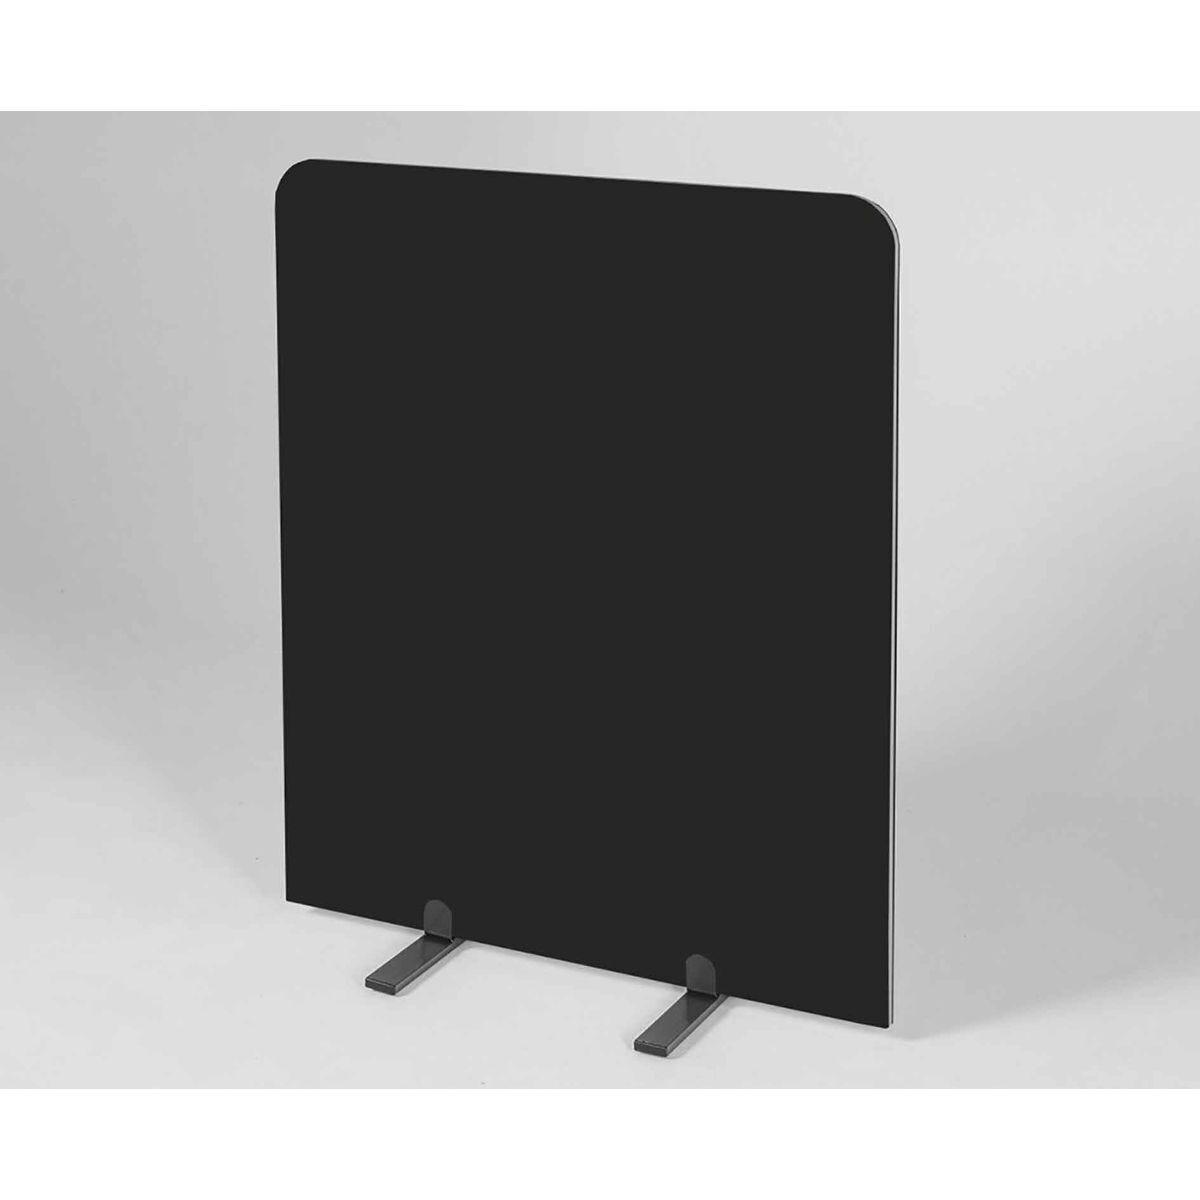 Metroplan BusyScreen Curve Screen 1200 x 1200mm Black